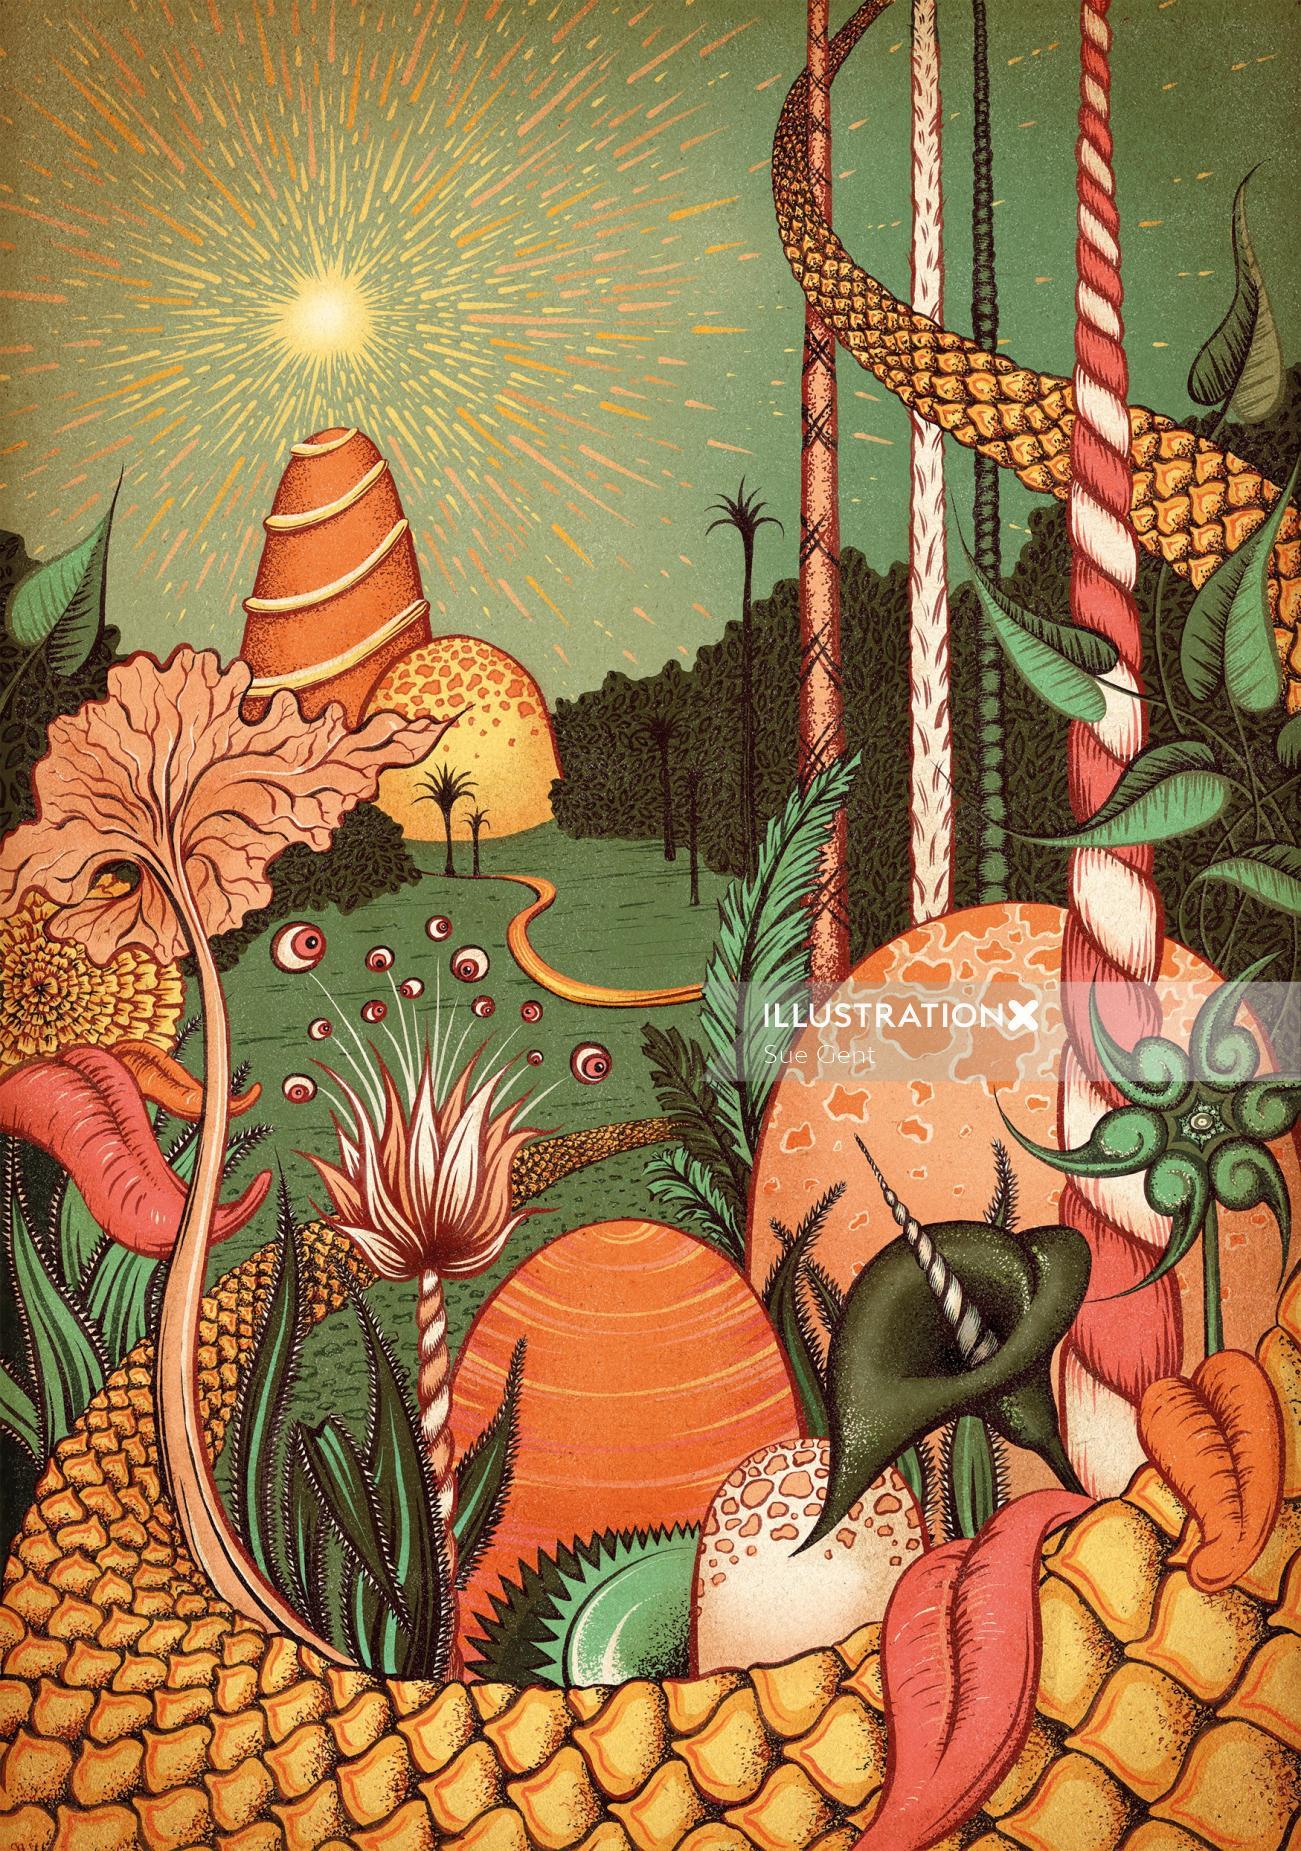 Nature editorial illustration